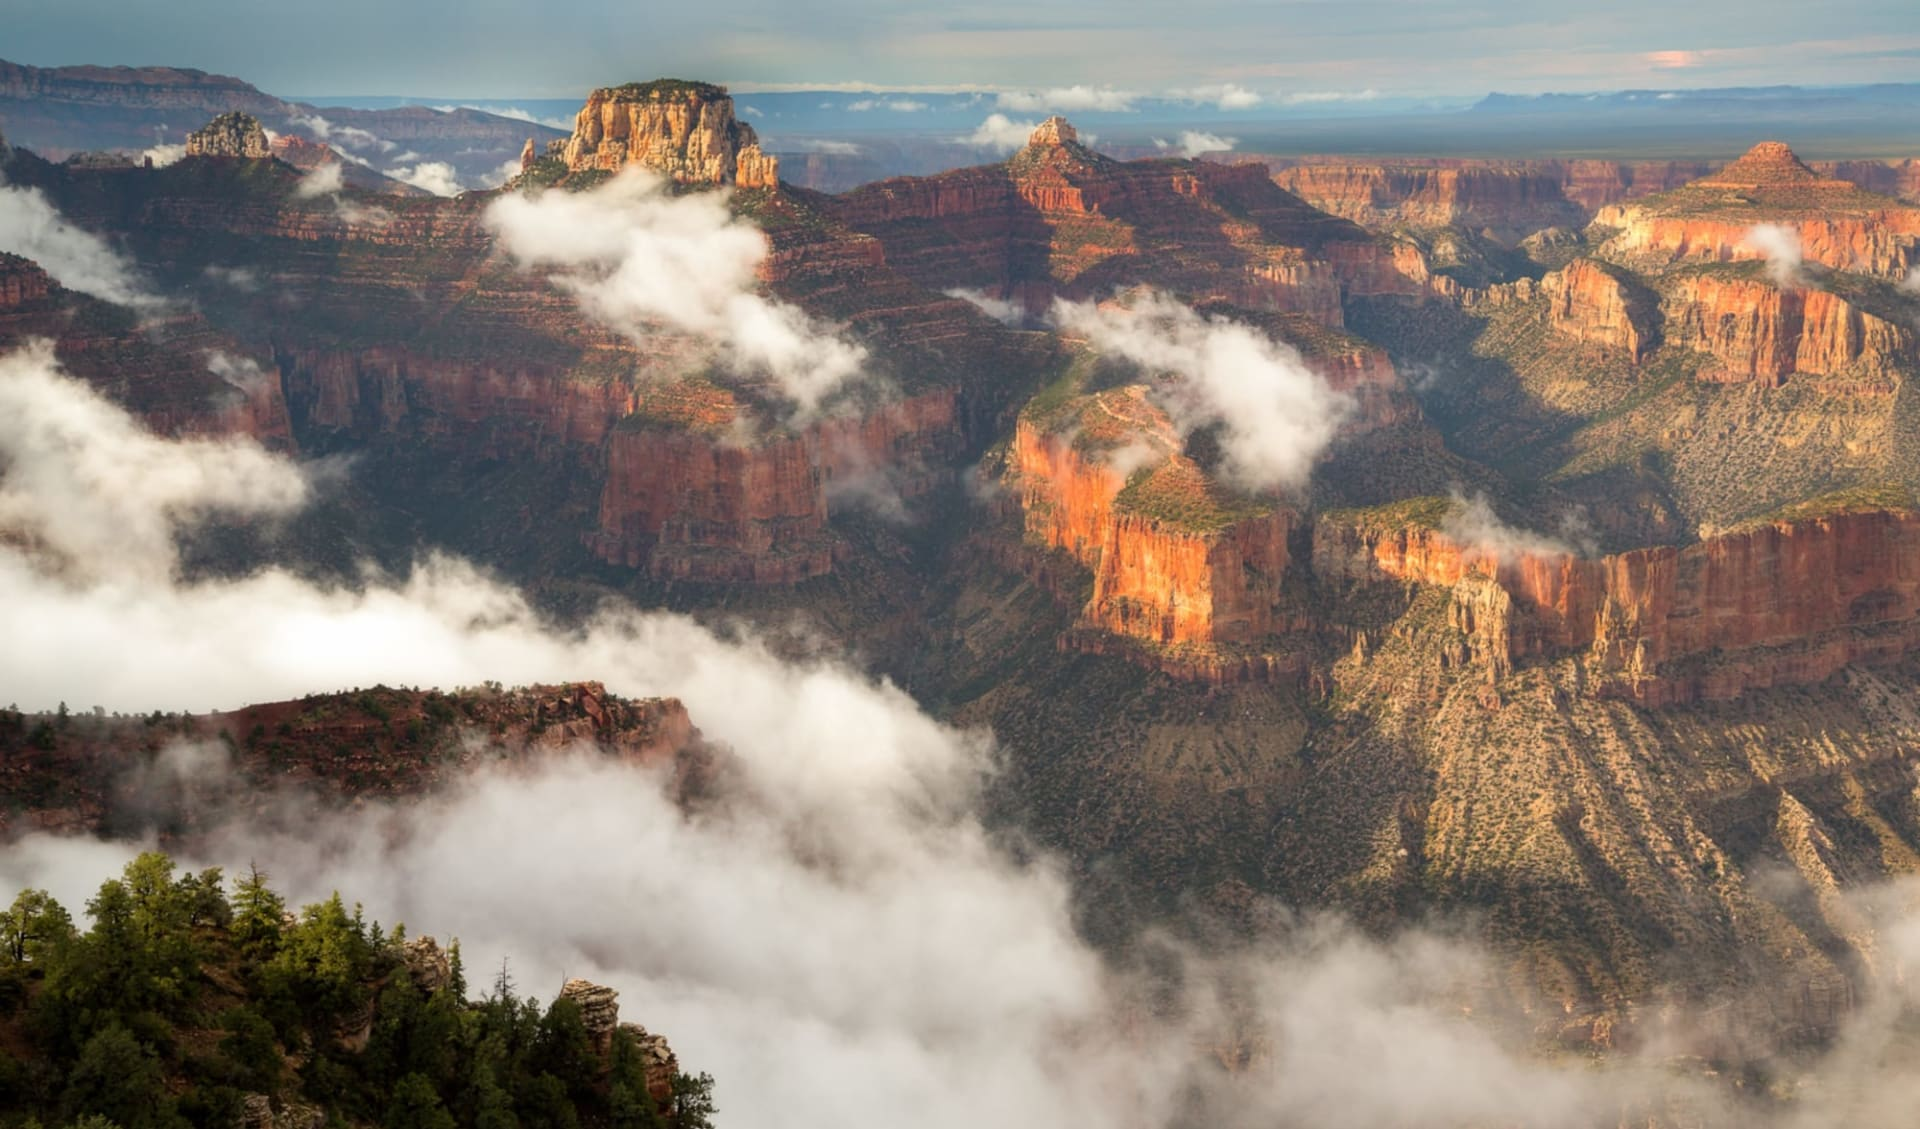 West Coast Insider ab San Francisco: USA - Arizona - Grand Canyon North Rim